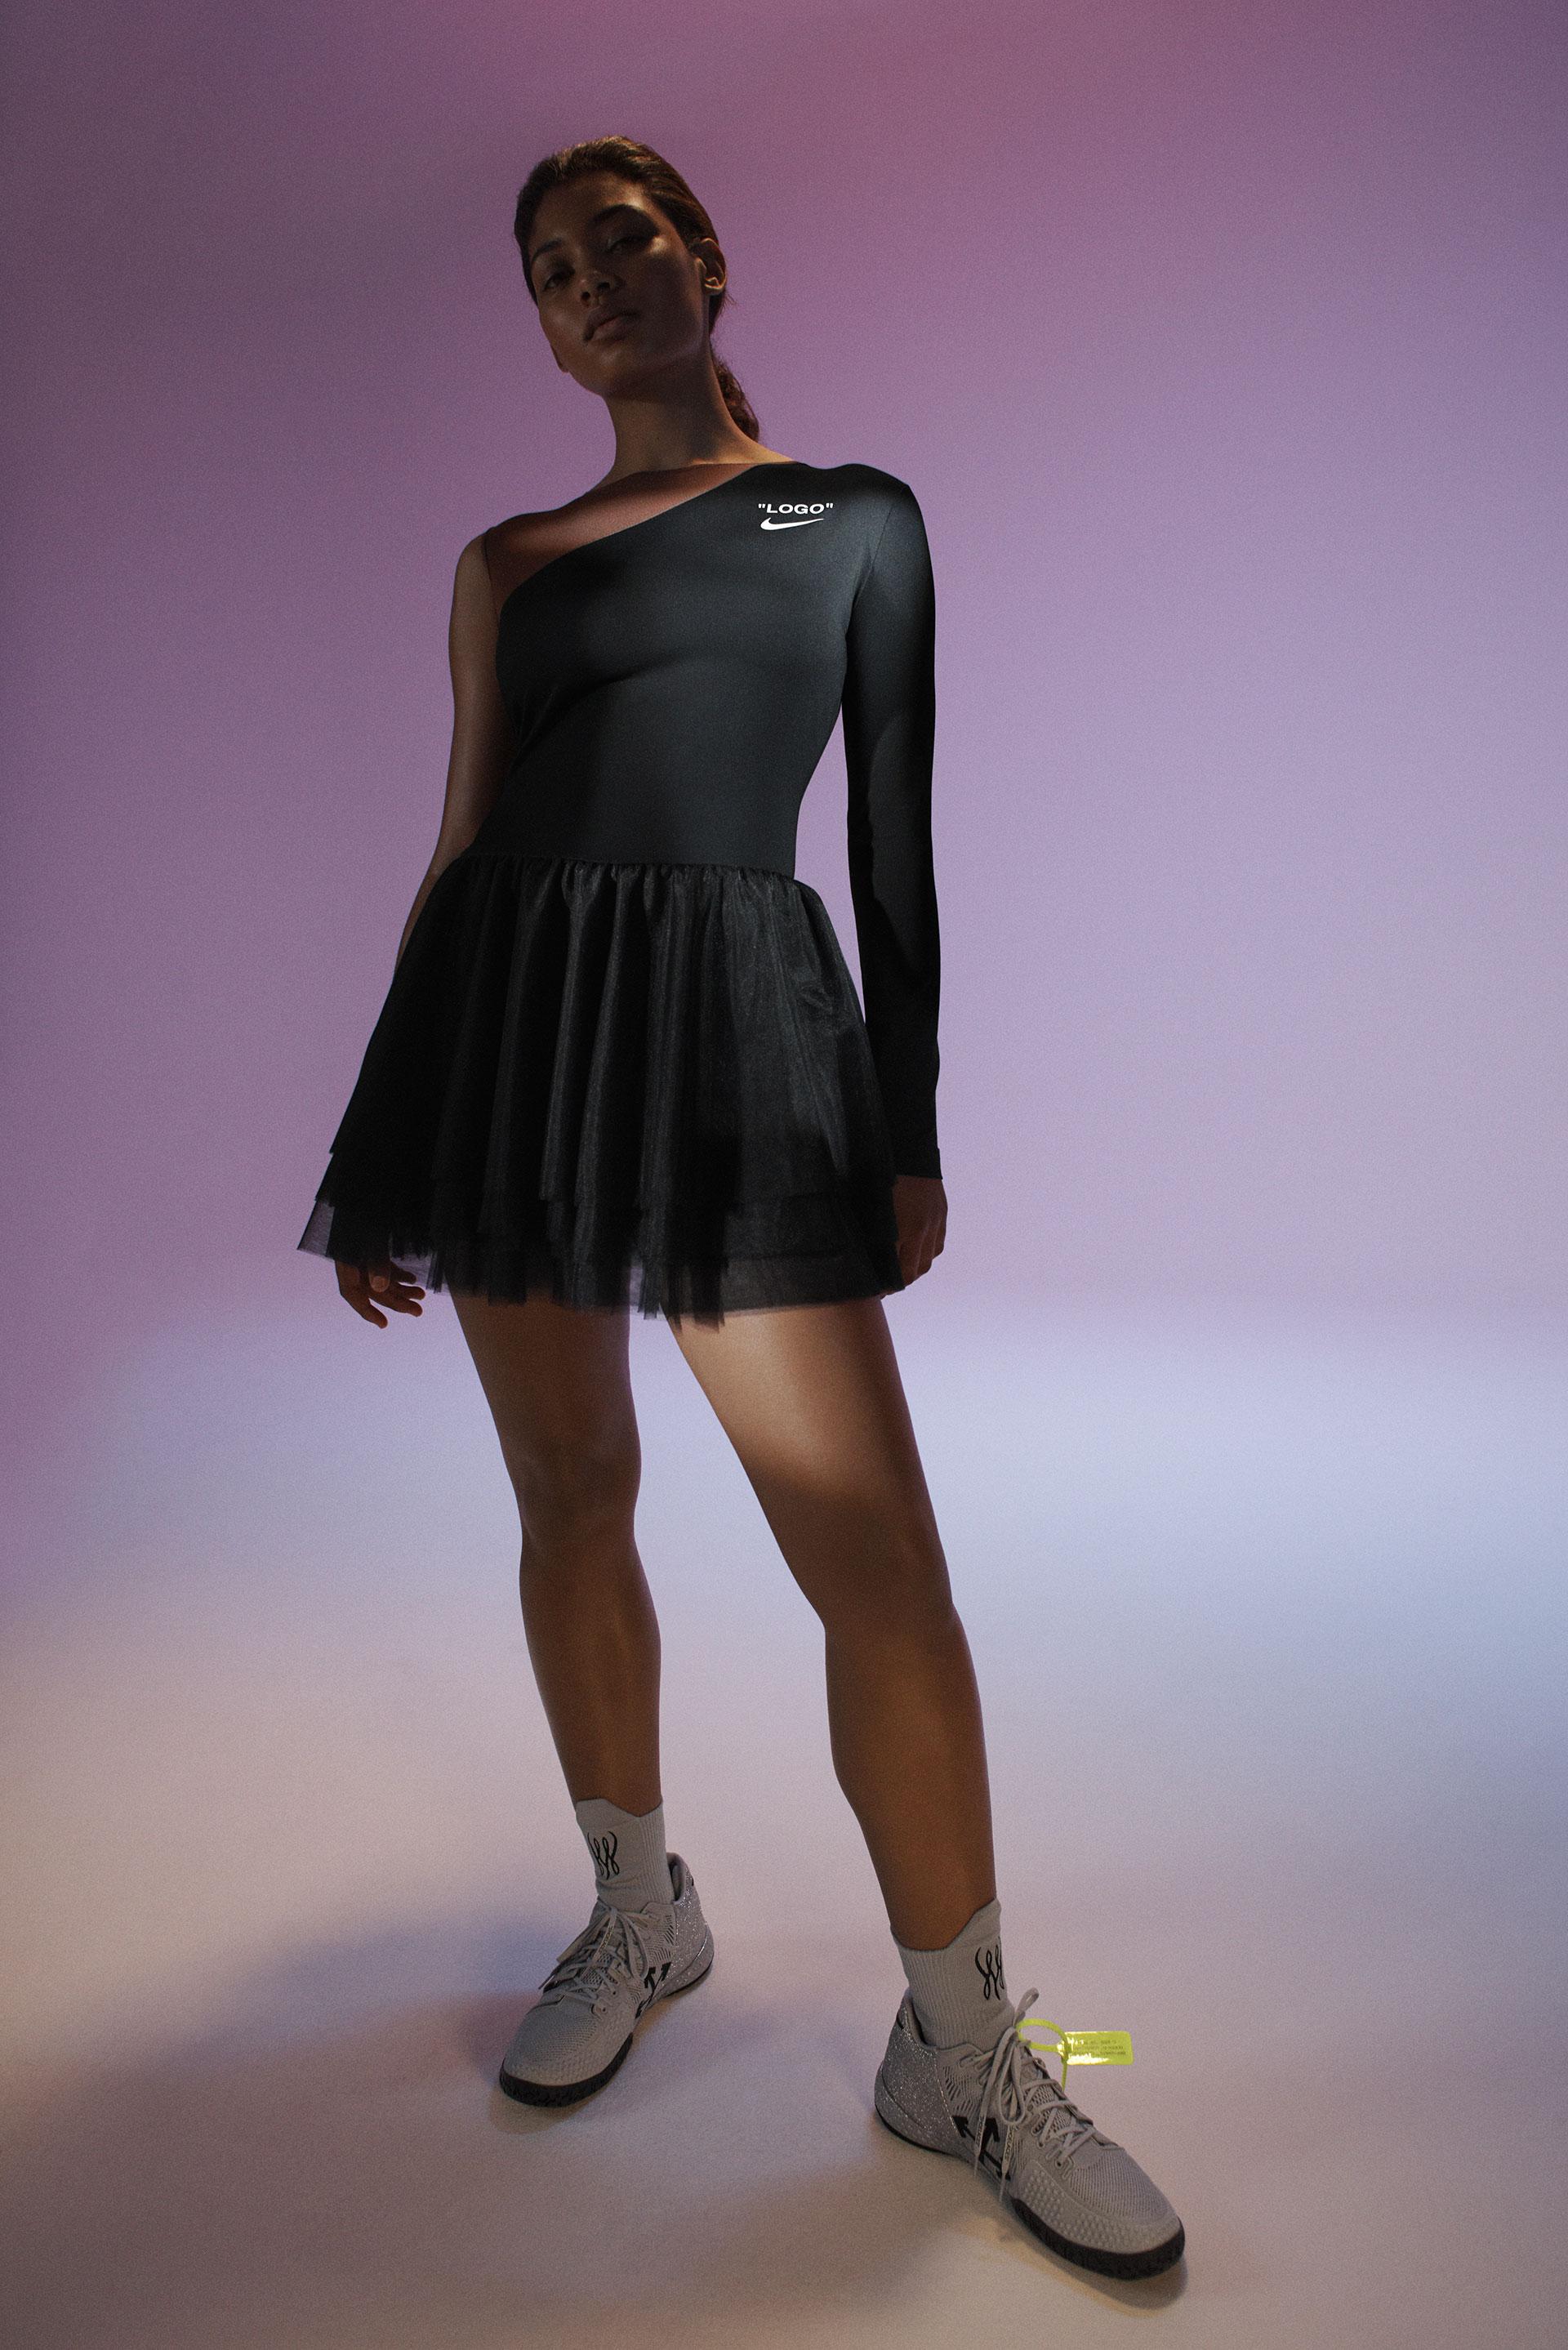 Nighttime dress designed by Virgil Abloh for Serena Williams